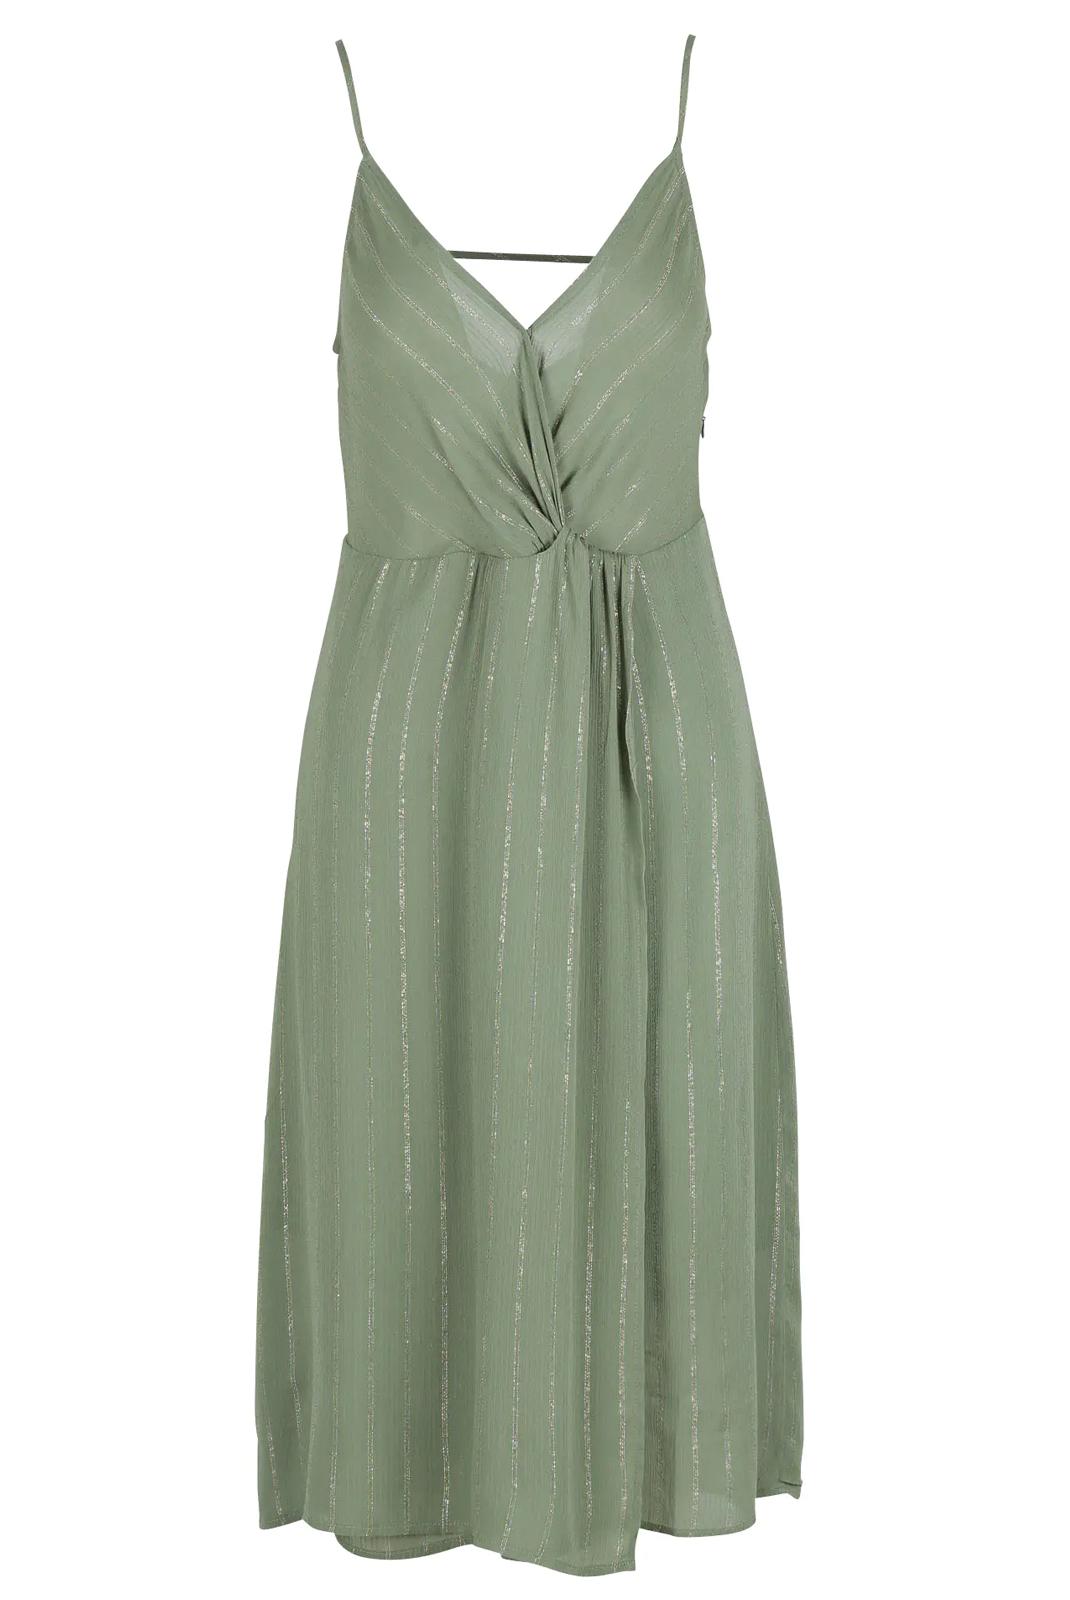 Robes  See u soon 20121106 GREEN